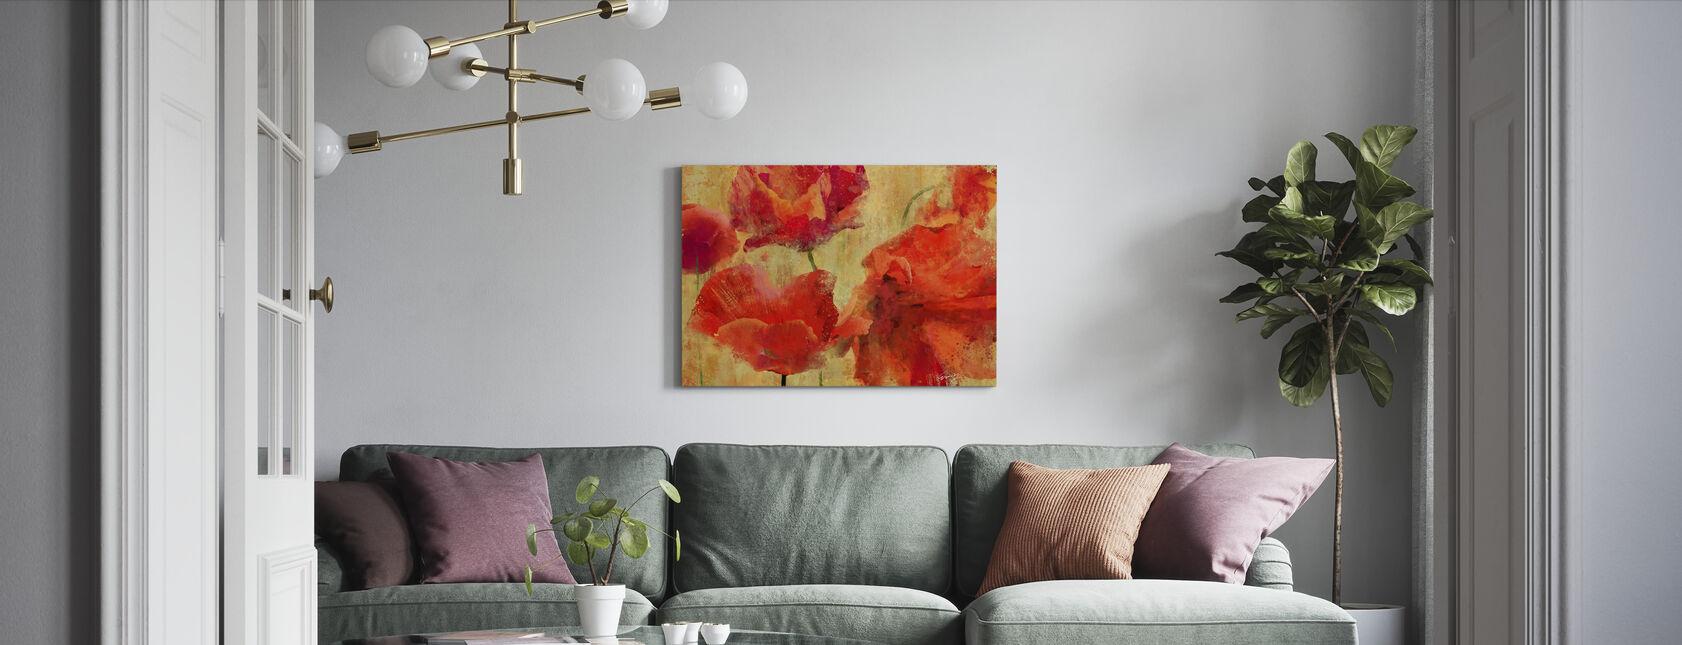 Uttrycksfulla blommor - Canvastavla - Vardagsrum